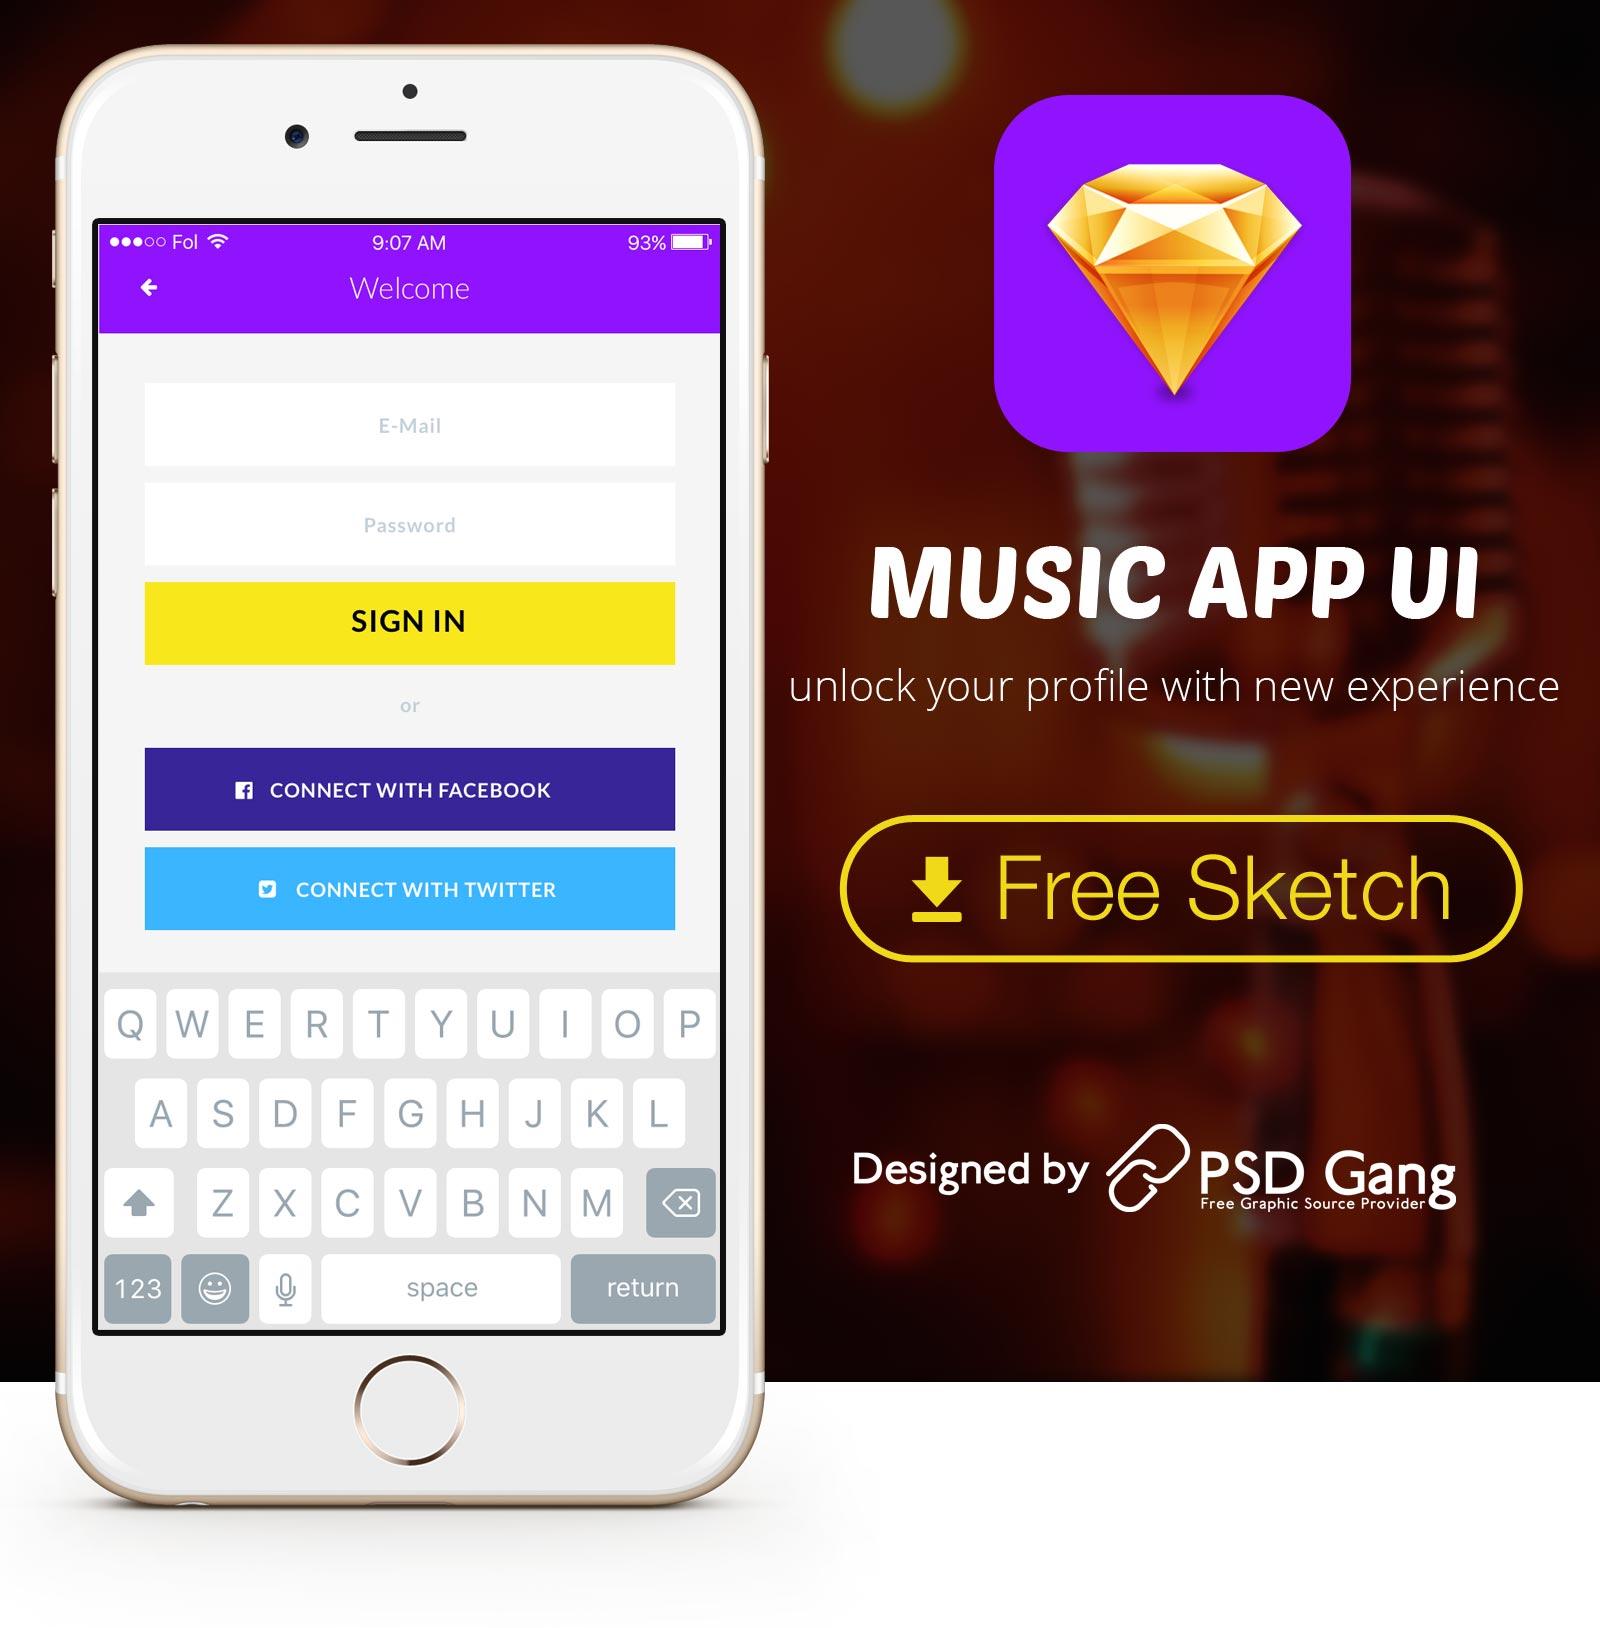 New Music App UI for Sketch Apple Tool